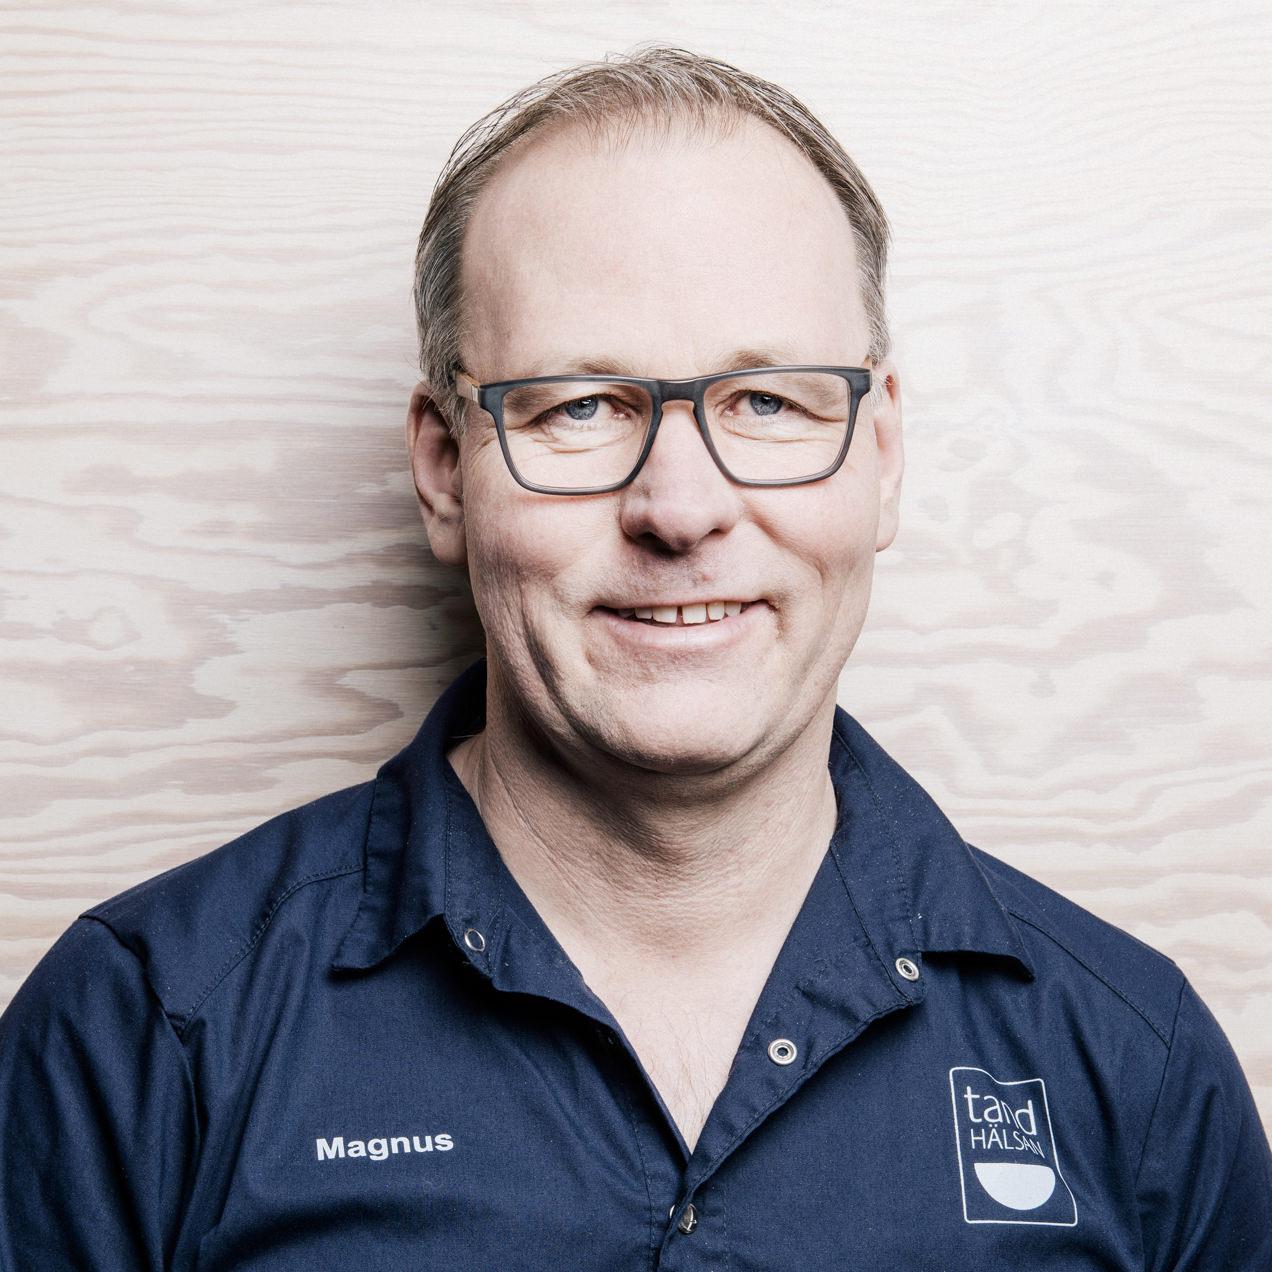 Magnus Bergström